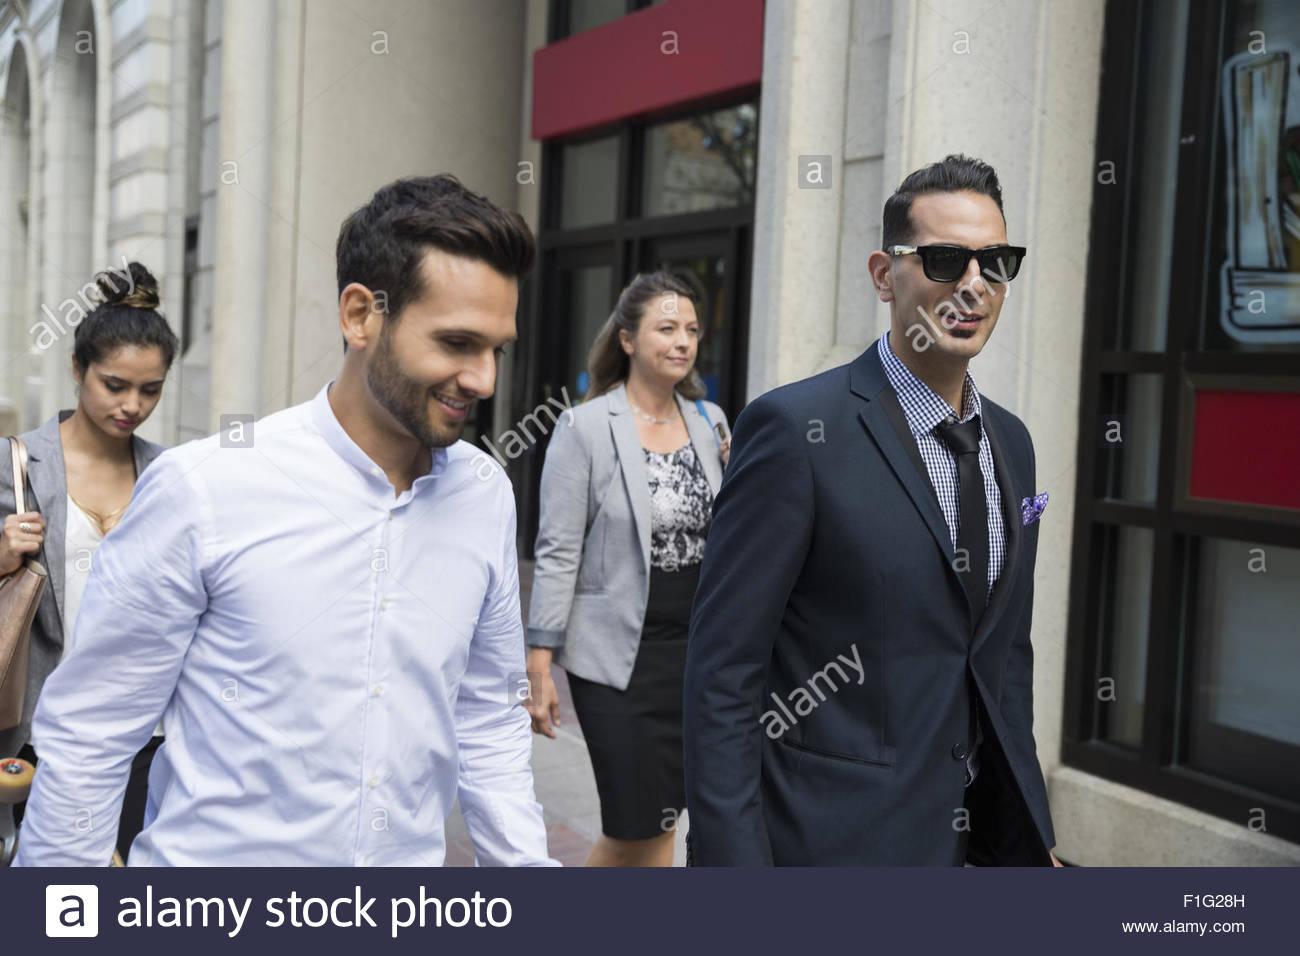 Business people walking on urban sidewalk - Stock Image